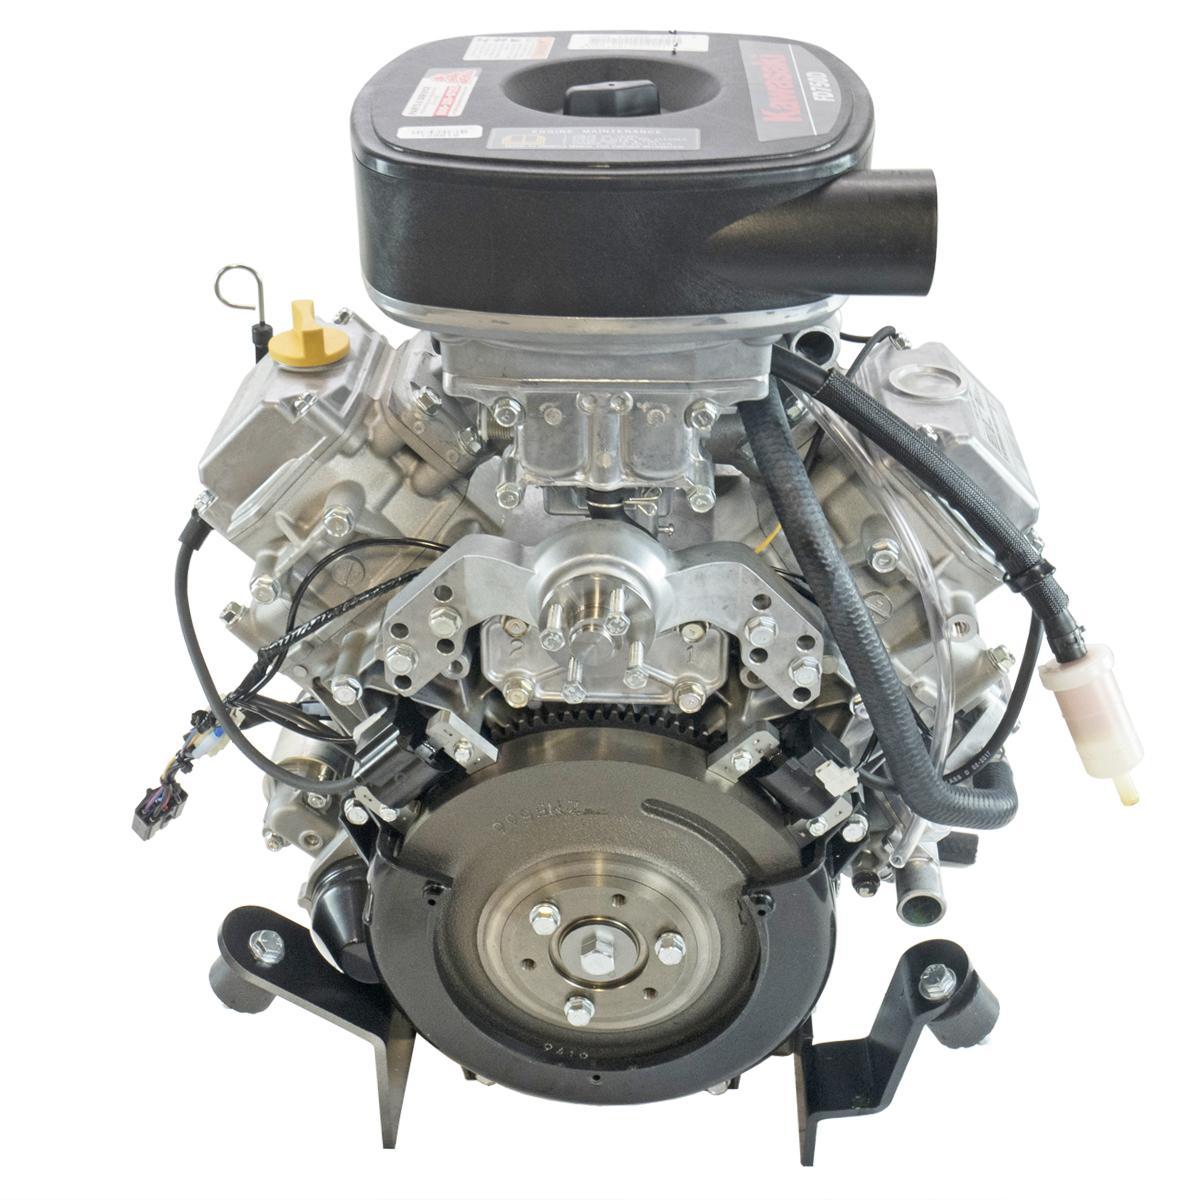 John deere 425 repower fd750d jd425c r1 sciox Images